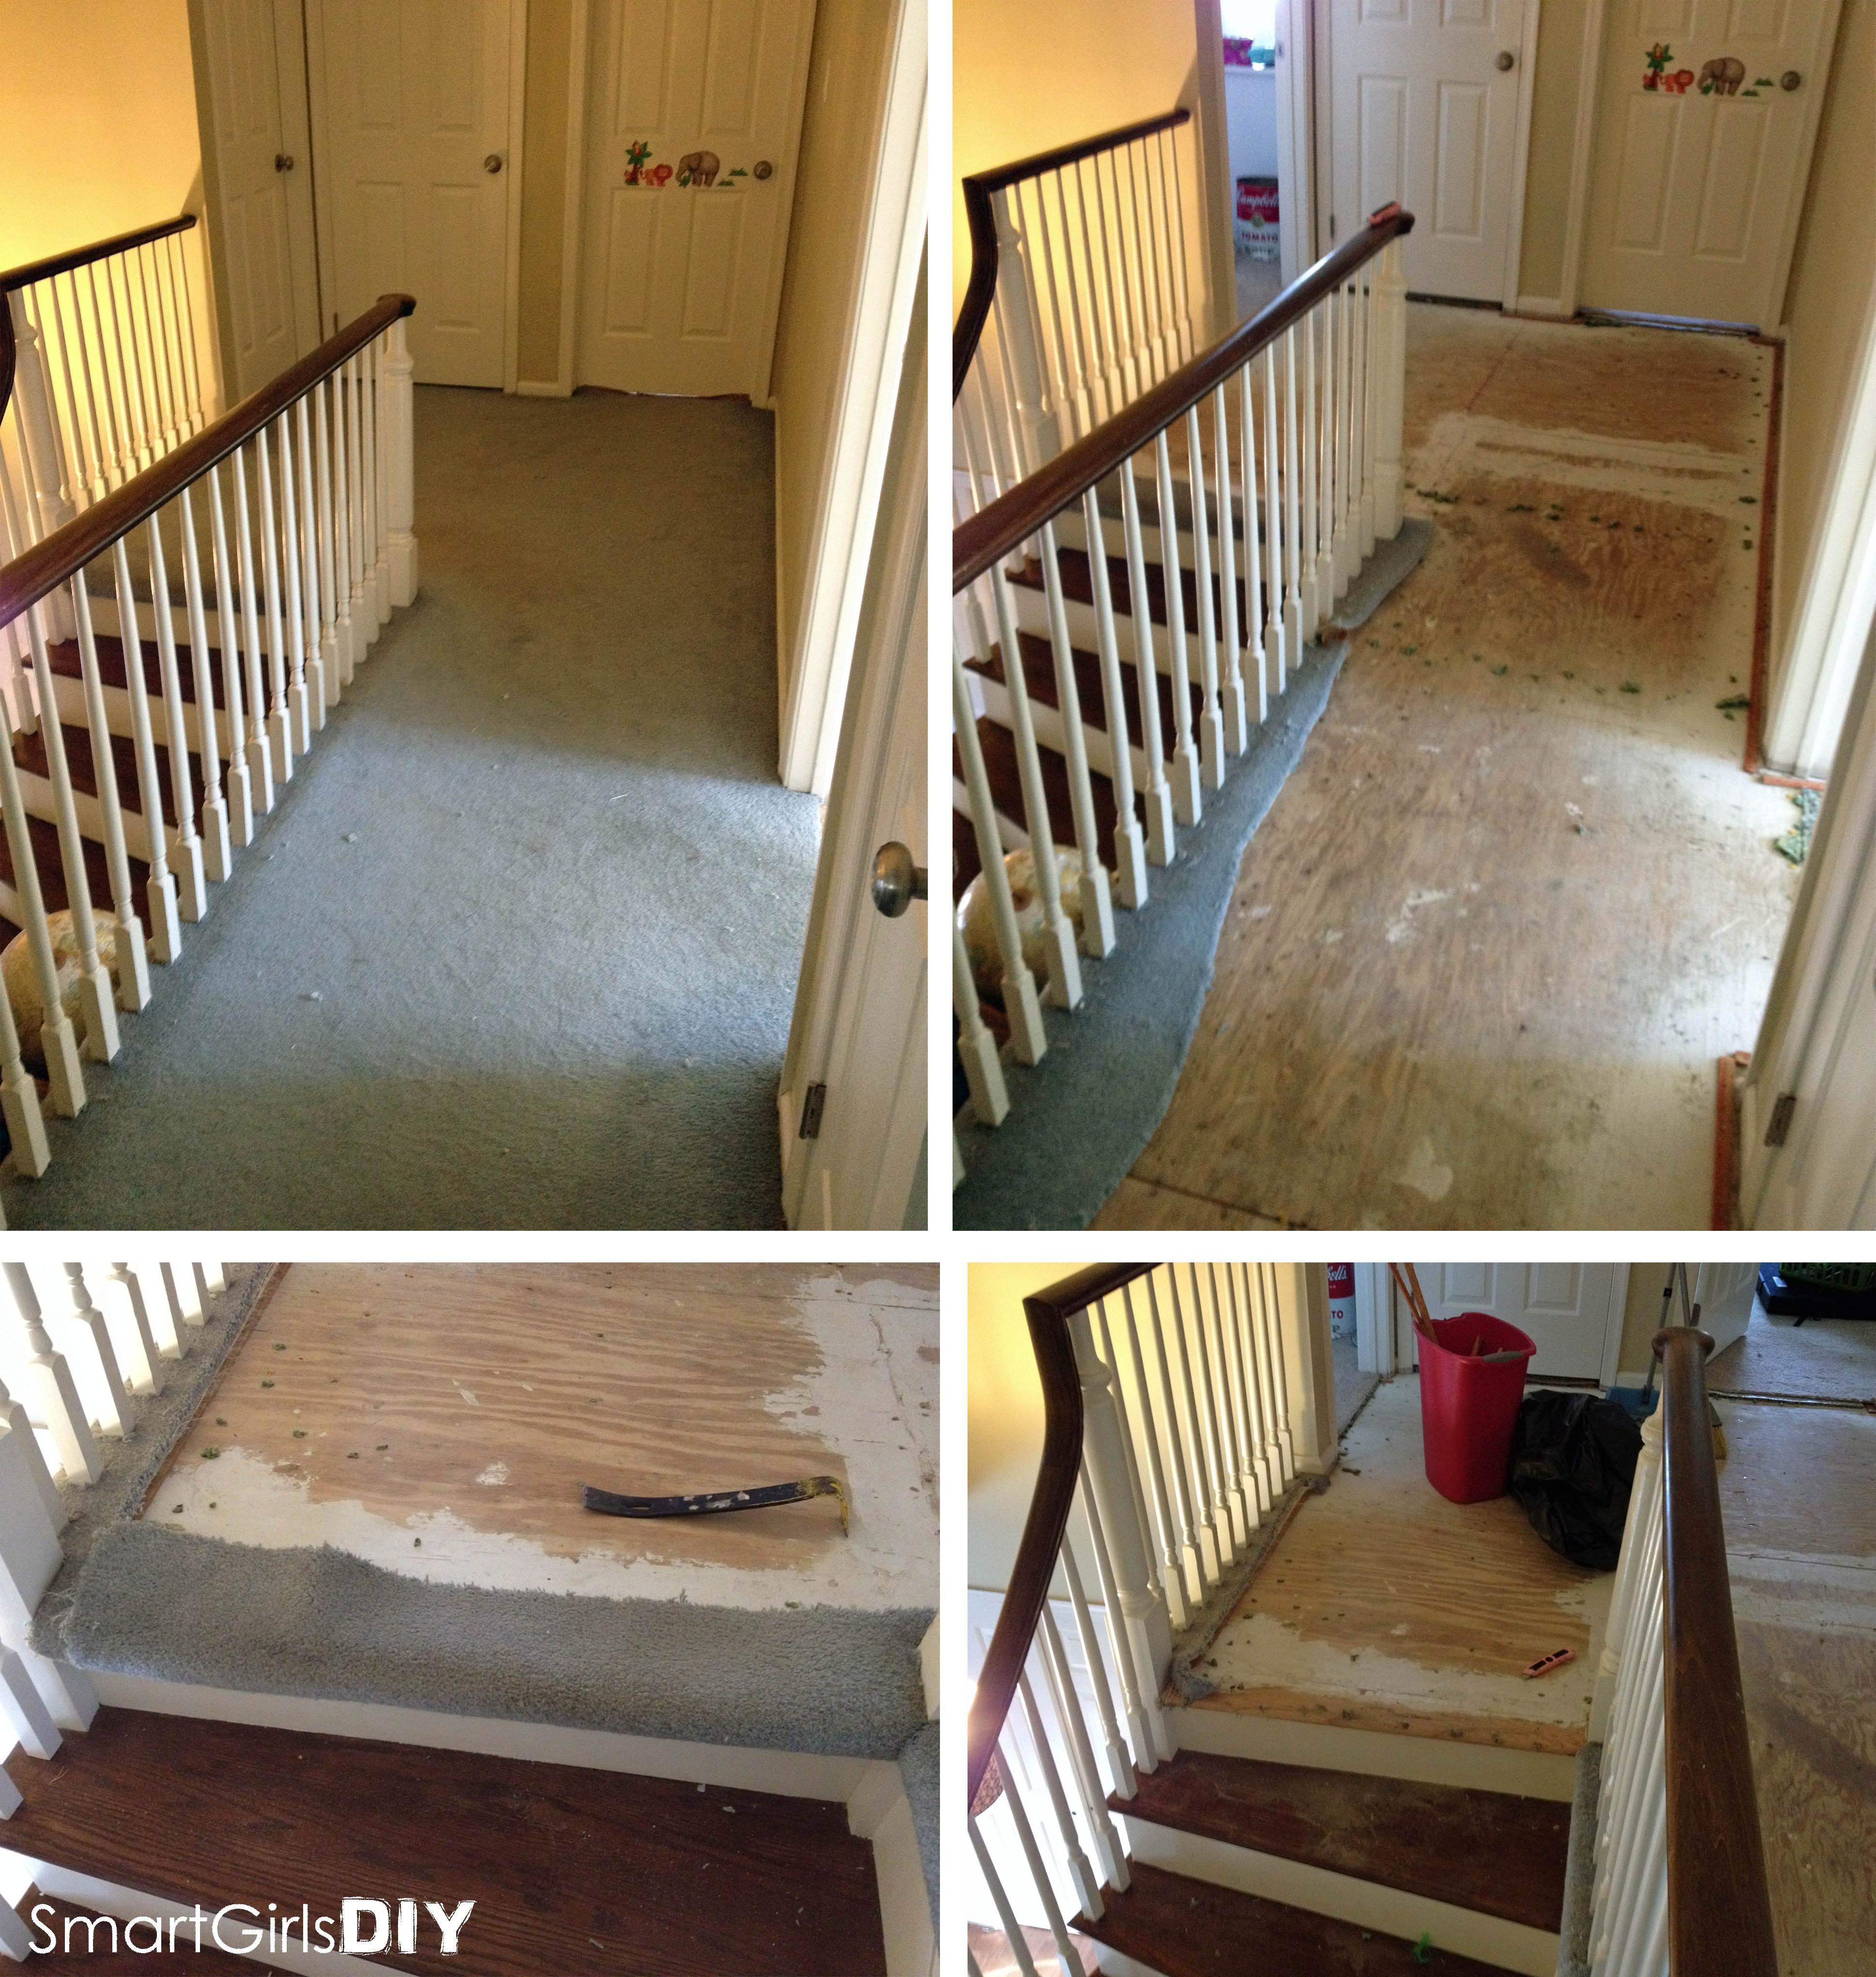 how to put down hardwood floors video of upstairs hallway 1 installing hardwood floors regarding removing carpet from hallway installing the hardwood floor